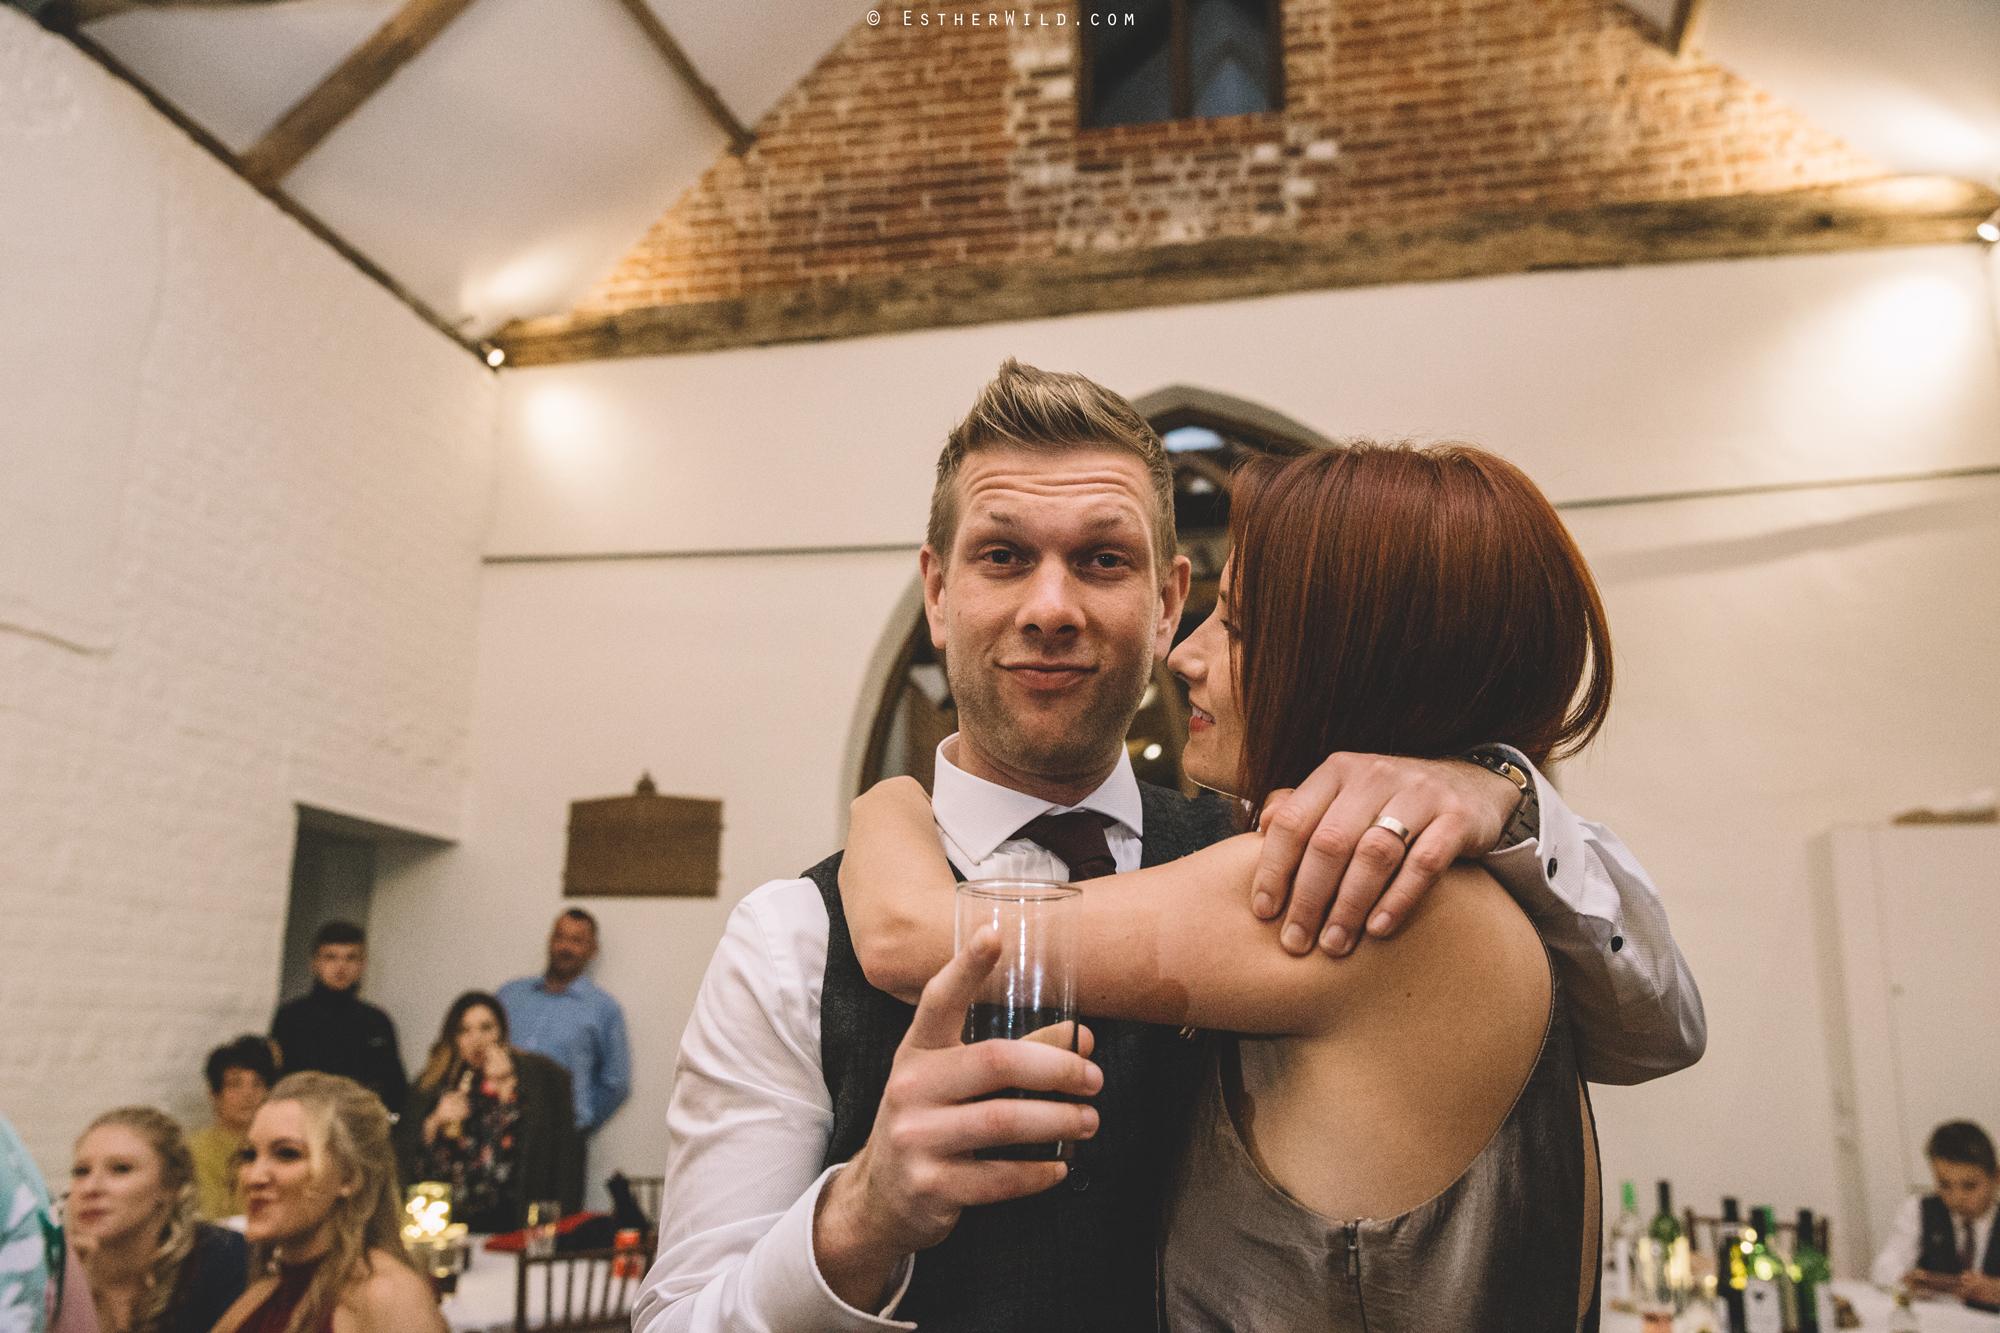 Reading_Room_Weddings_Alby_Norwich_Photographer_Esther_Wild_IMG_3769.jpg